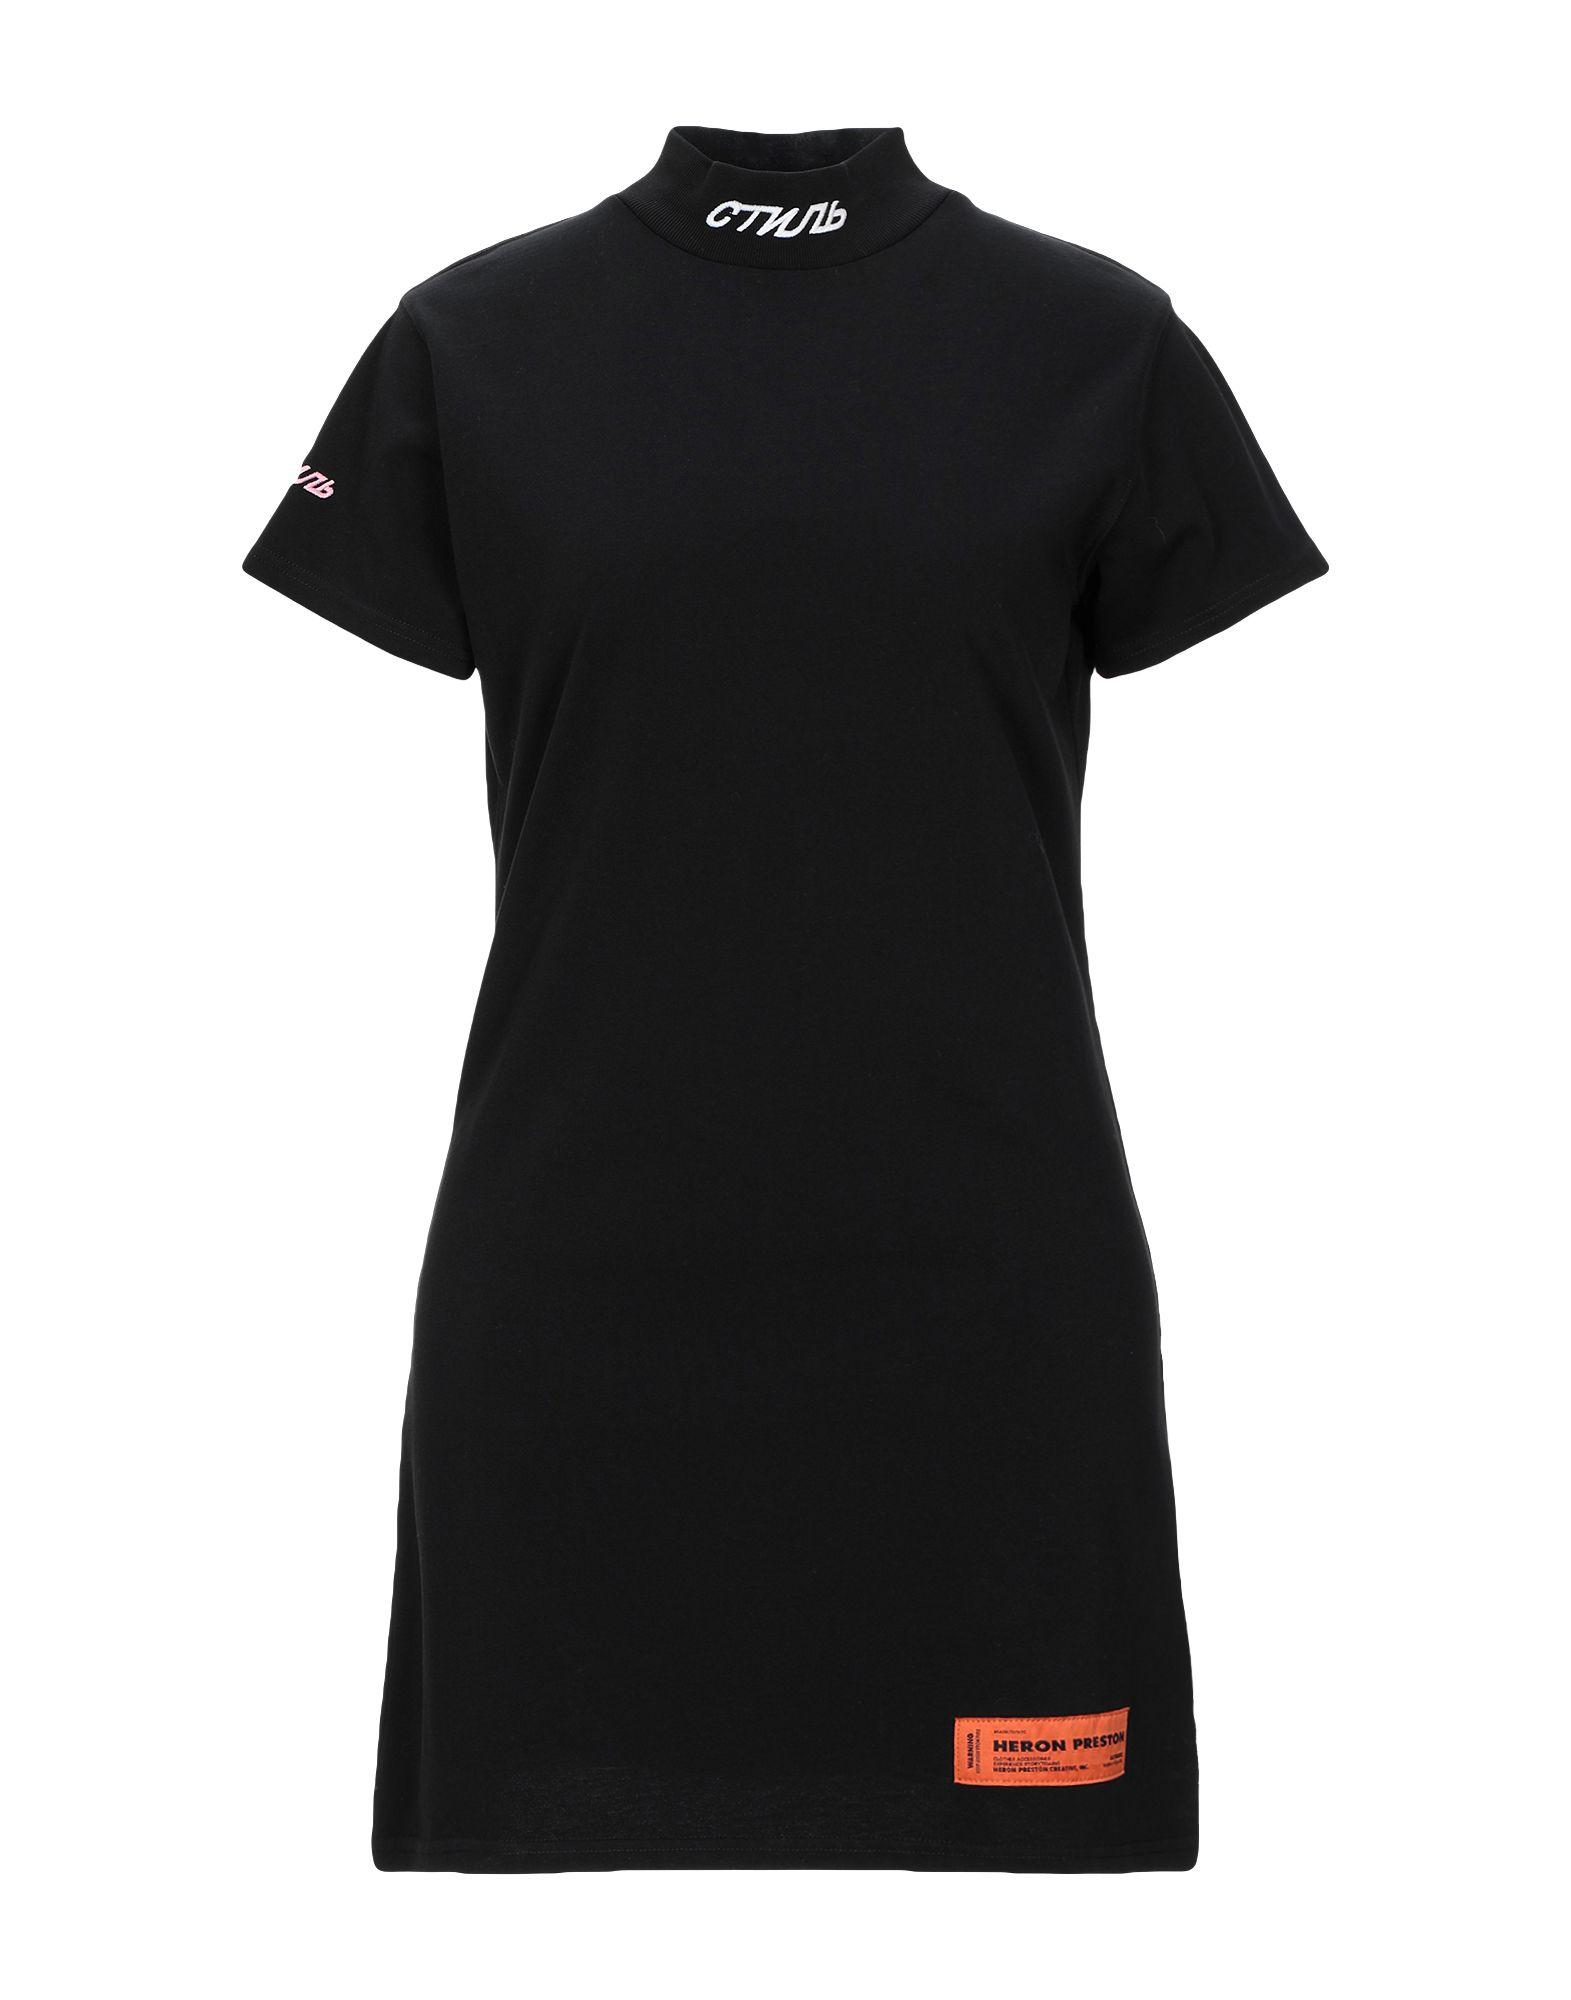 HERON PRESTON Short dresses. jersey, logo, embroidered detailing, solid color, turtleneck, short sleeves, no pockets, no fastening, unlined. 100% Cotton